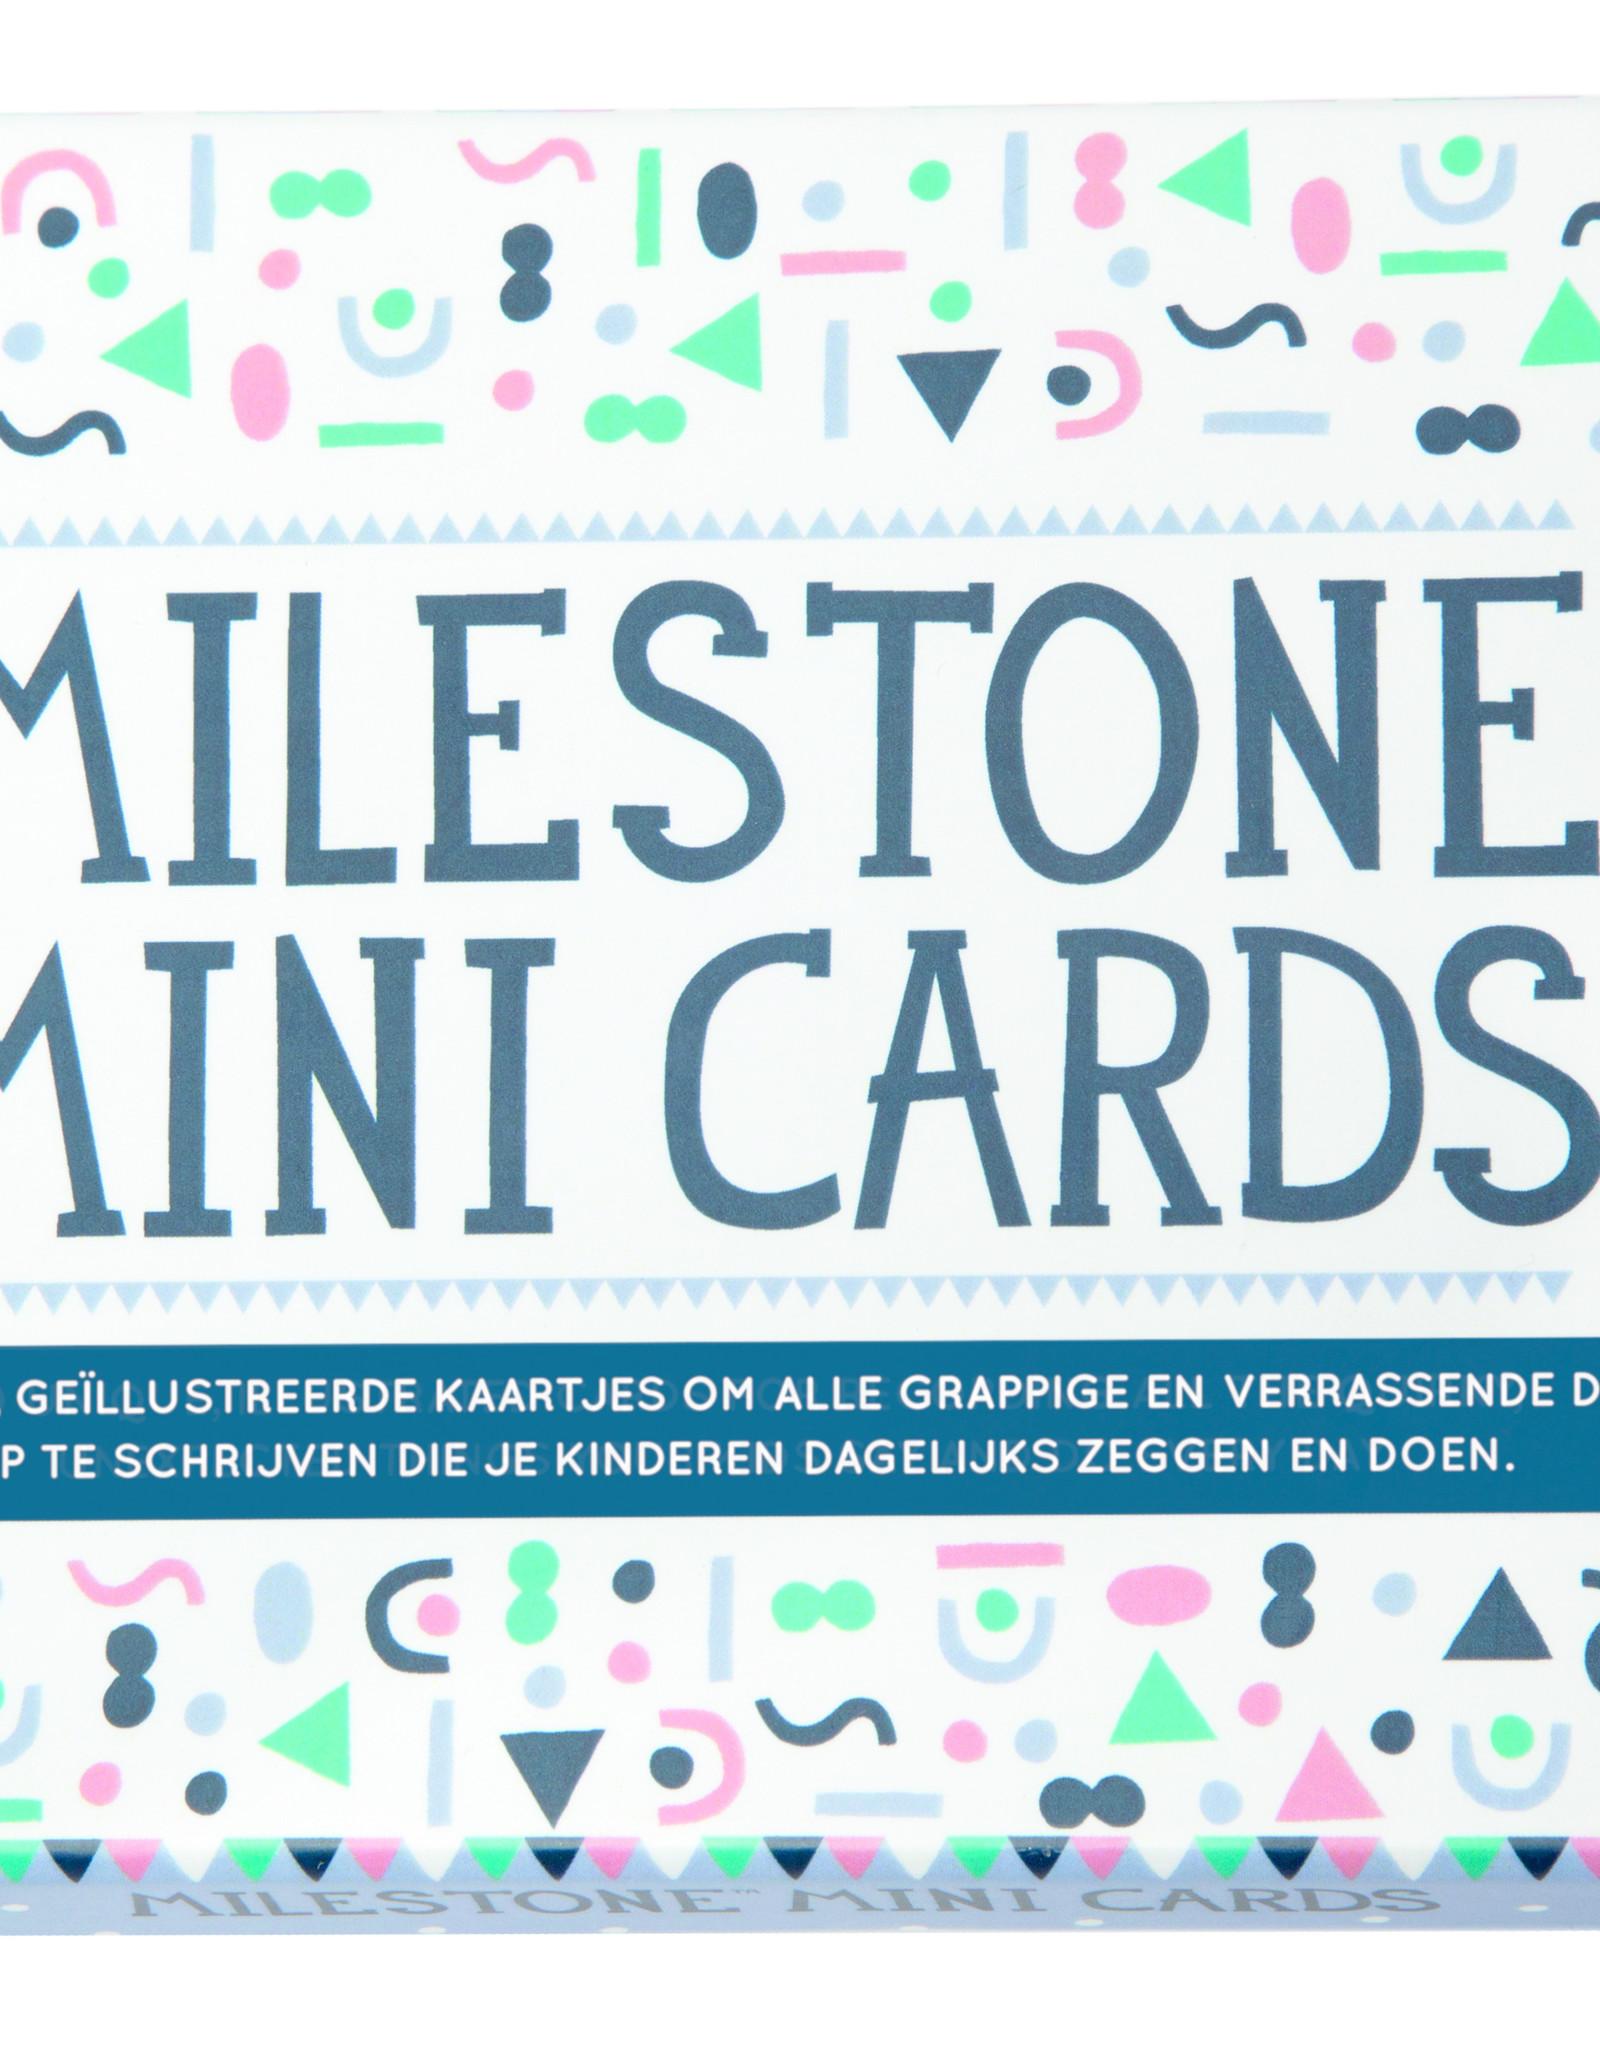 Milestone™ MINI CARDS - NL